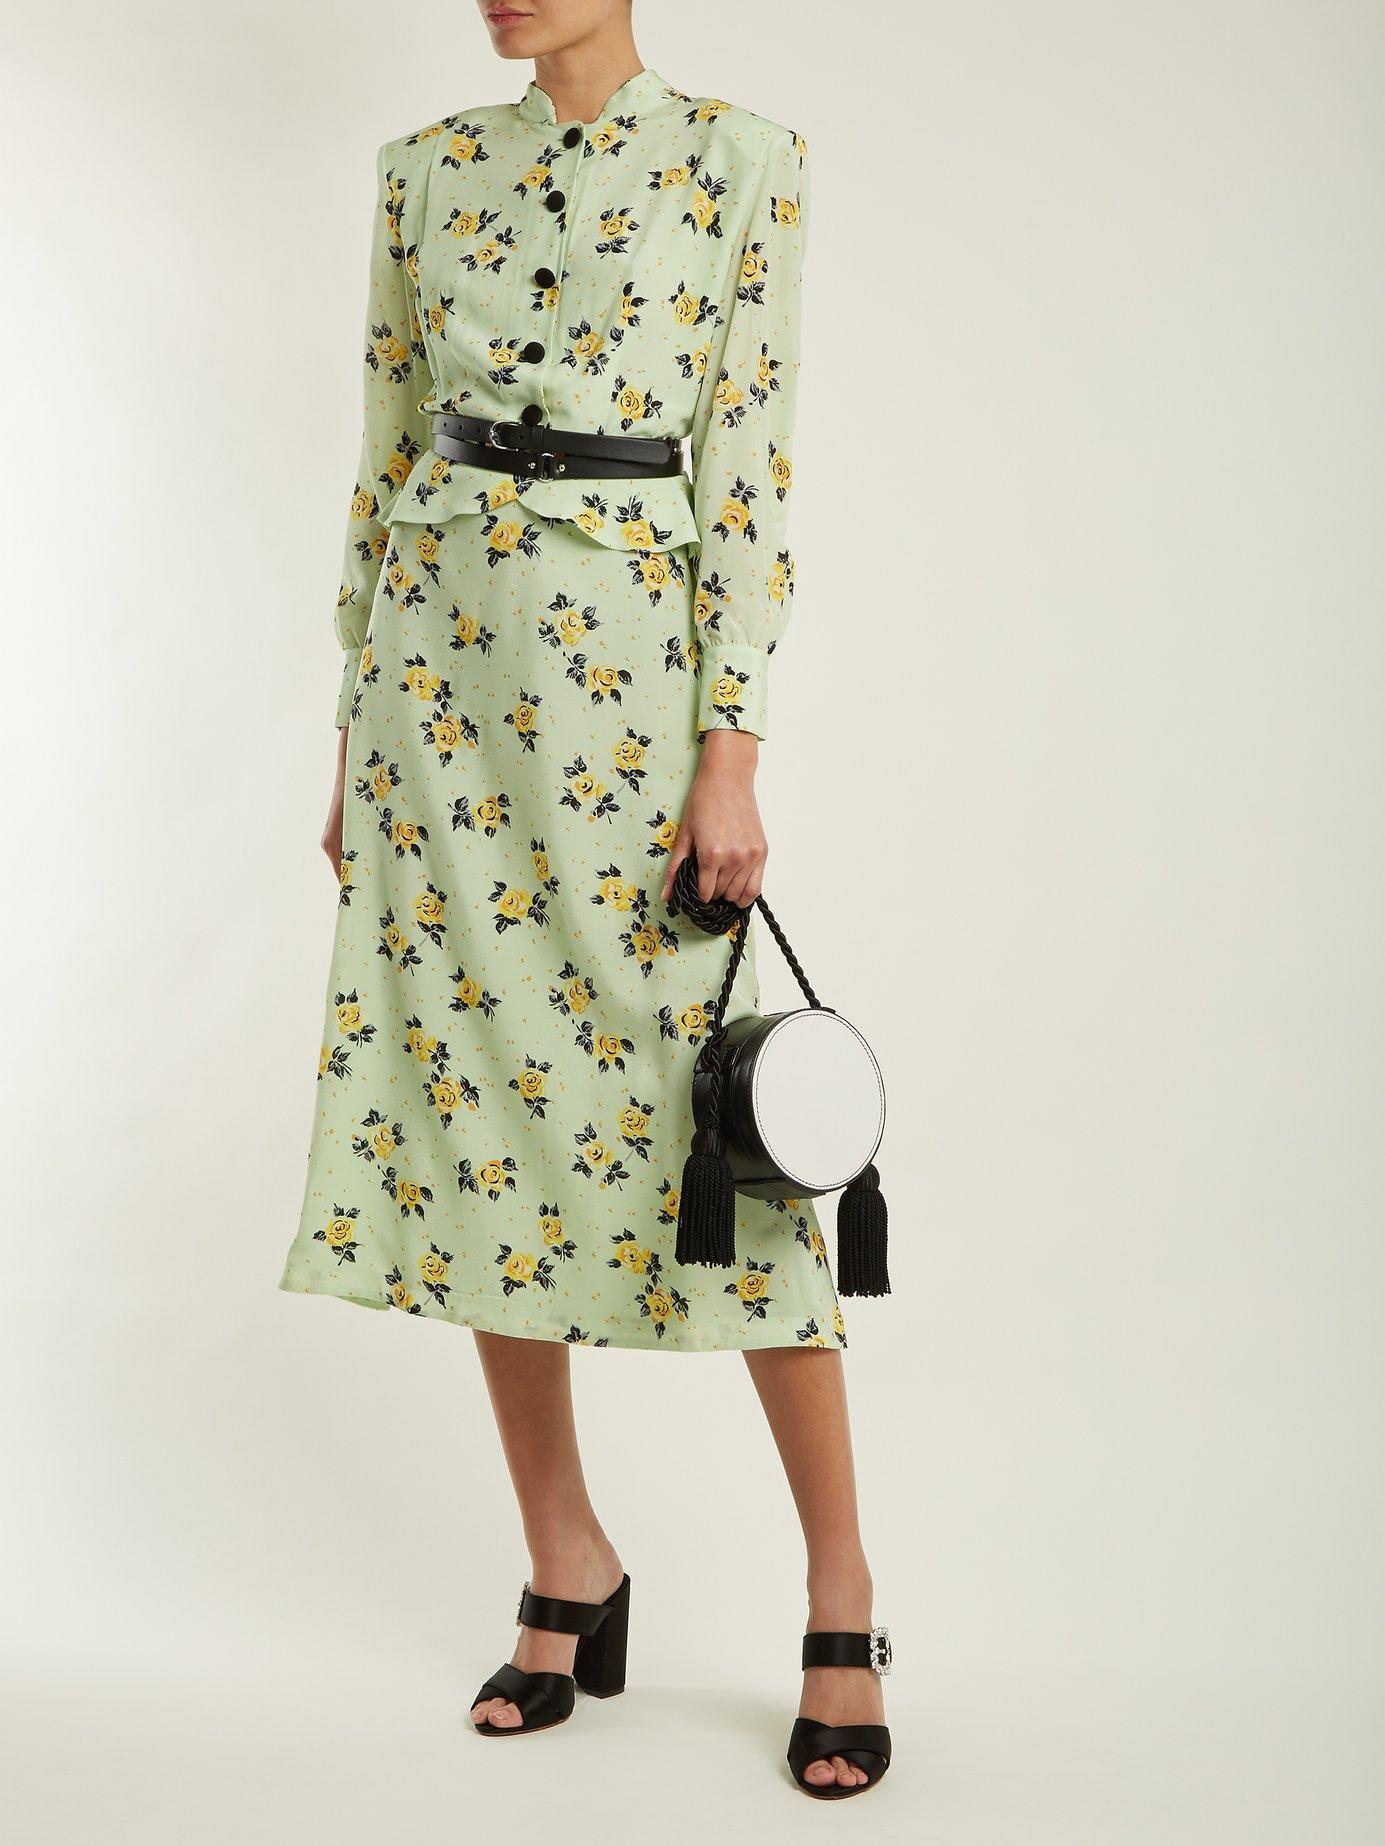 Rose-print peplum silk dress by Alessandra Rich